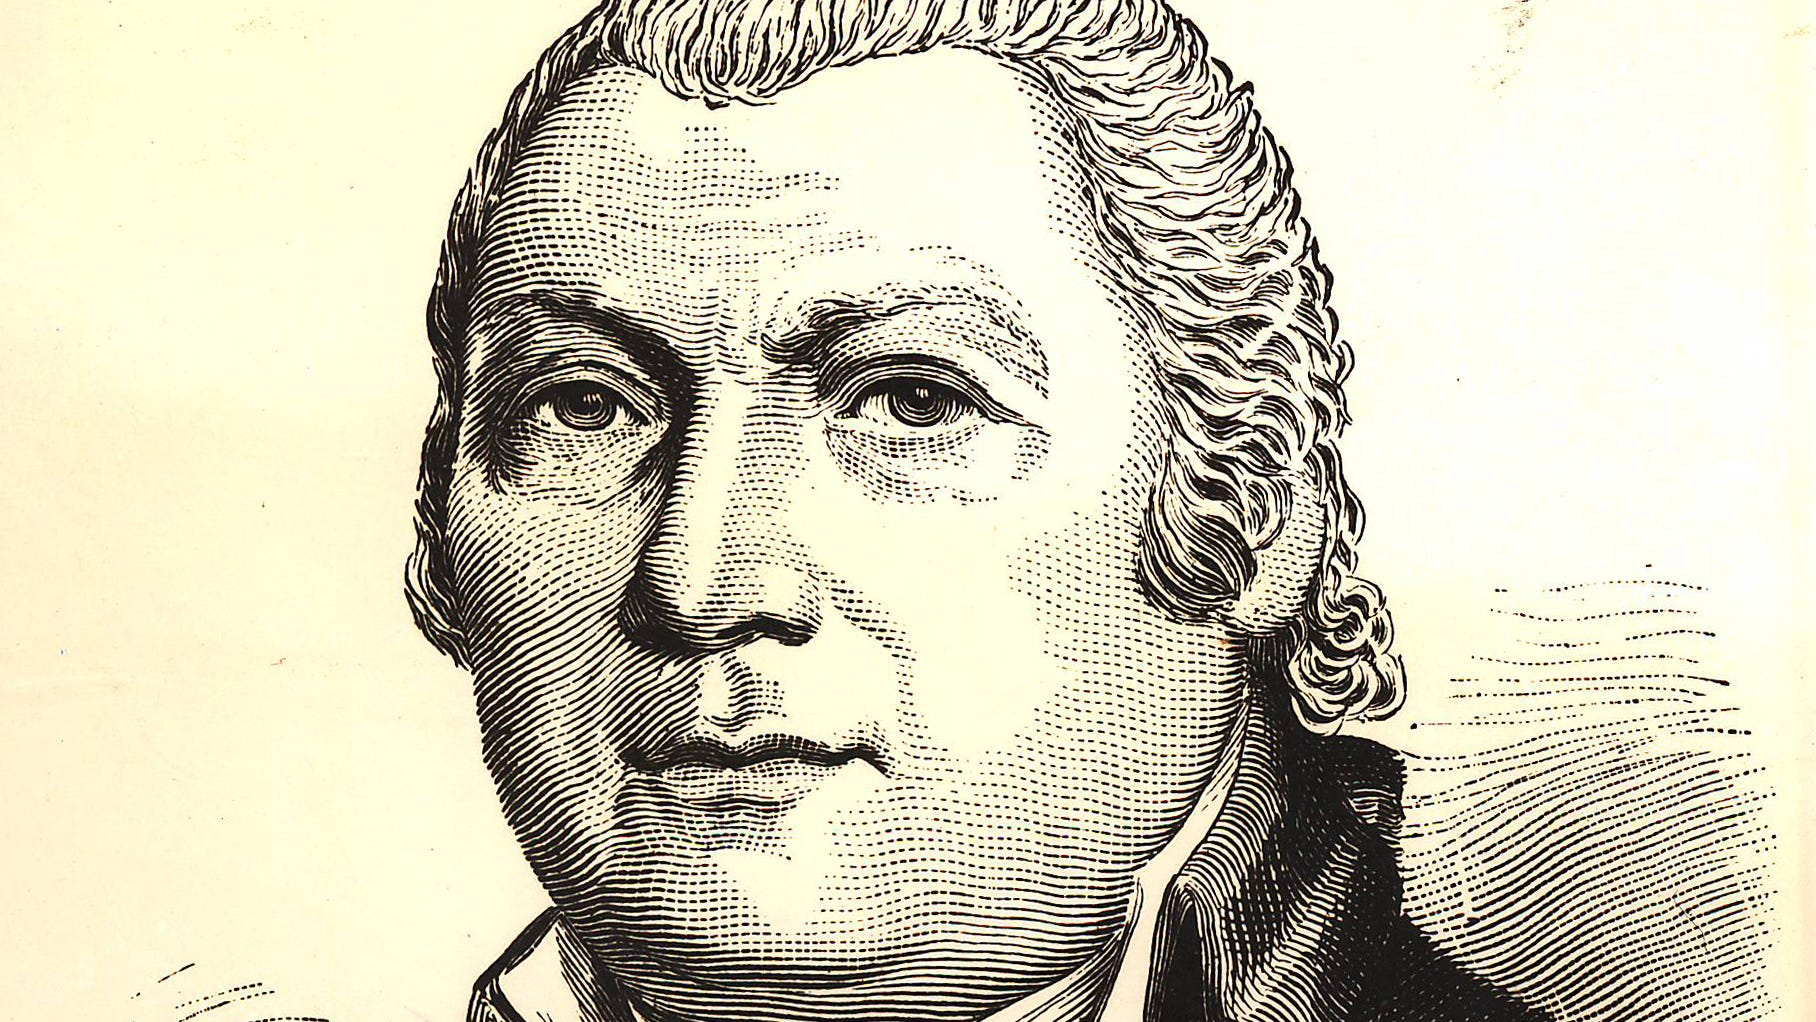 David Ziegler, first mayor of Cincinnati, was a patriot during the Revolutionary War.